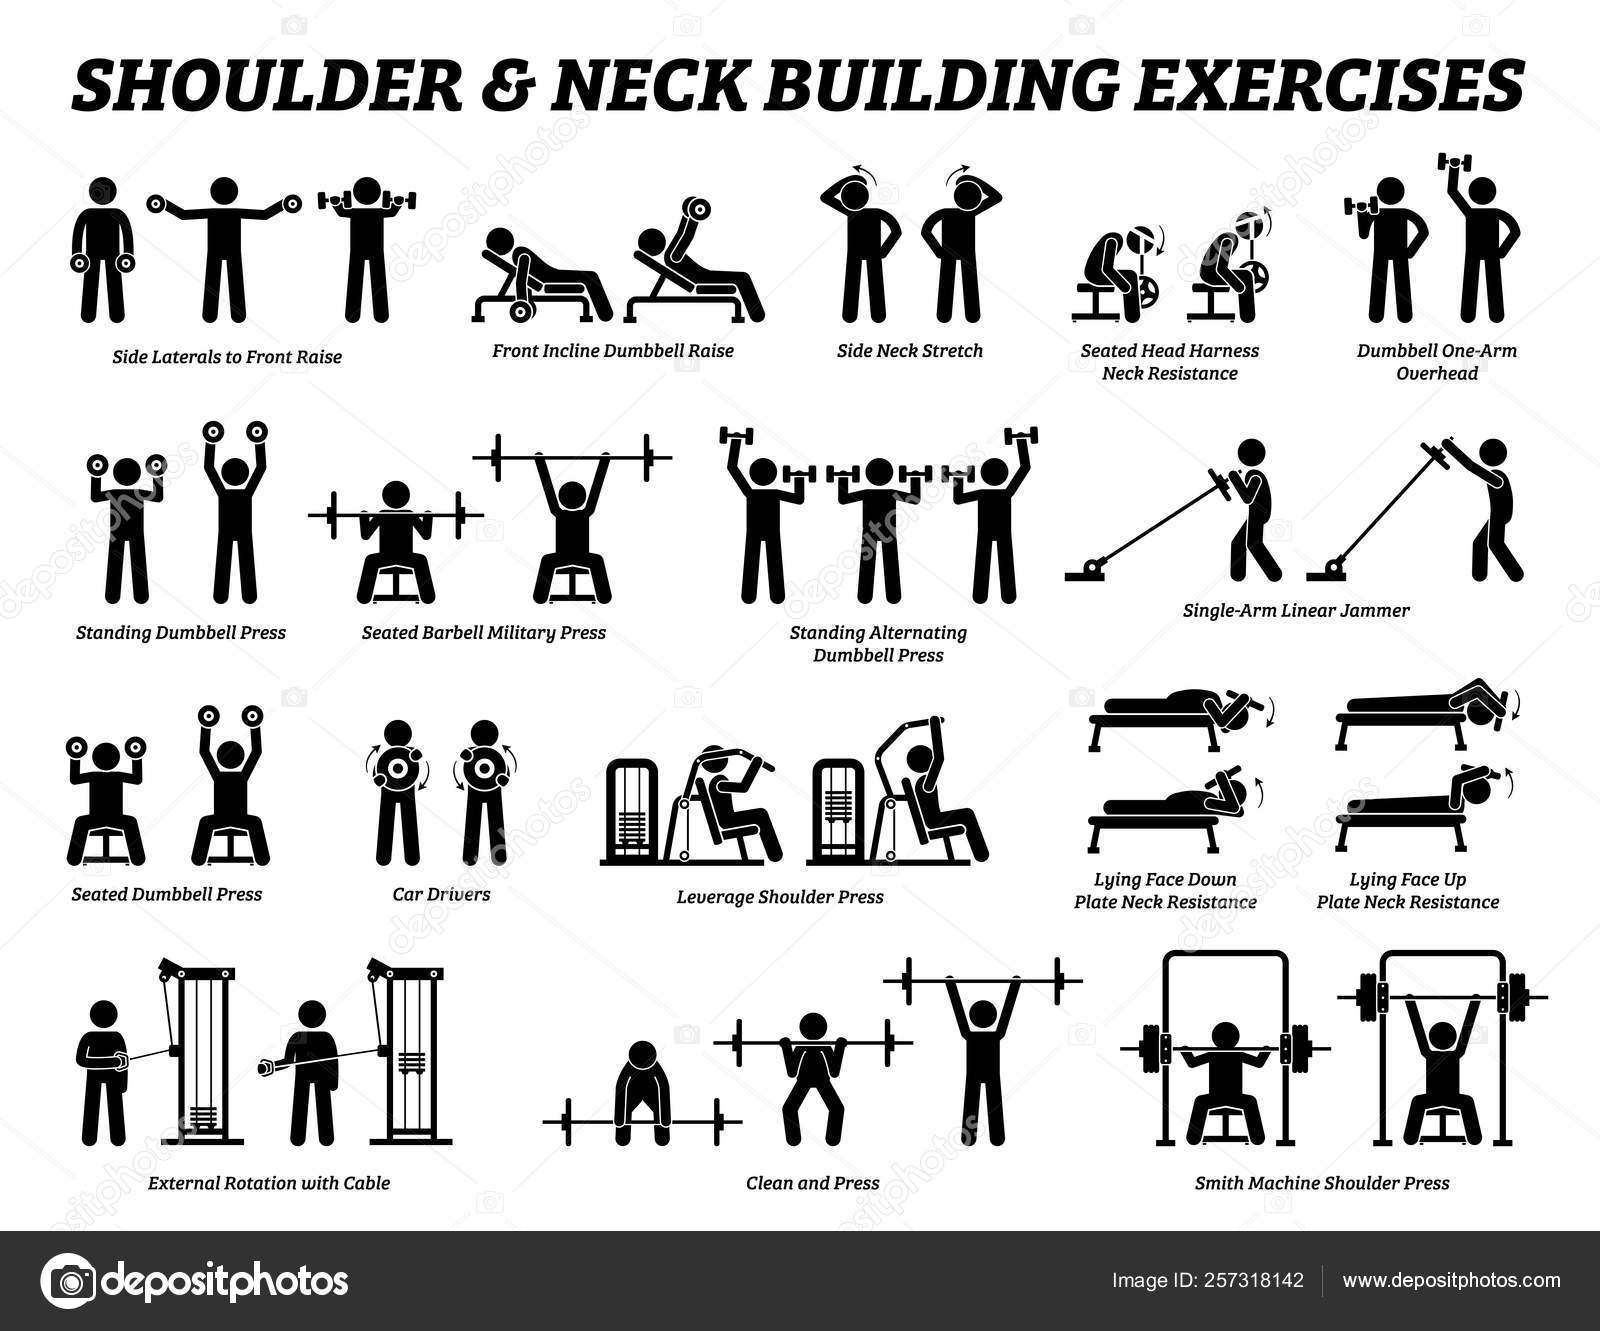 Pictures Shoulder Exercises Shoulder Neck Building Exercise Muscle Building Stick Figure Pictograms Set Stock Vector C Leremy 257318142